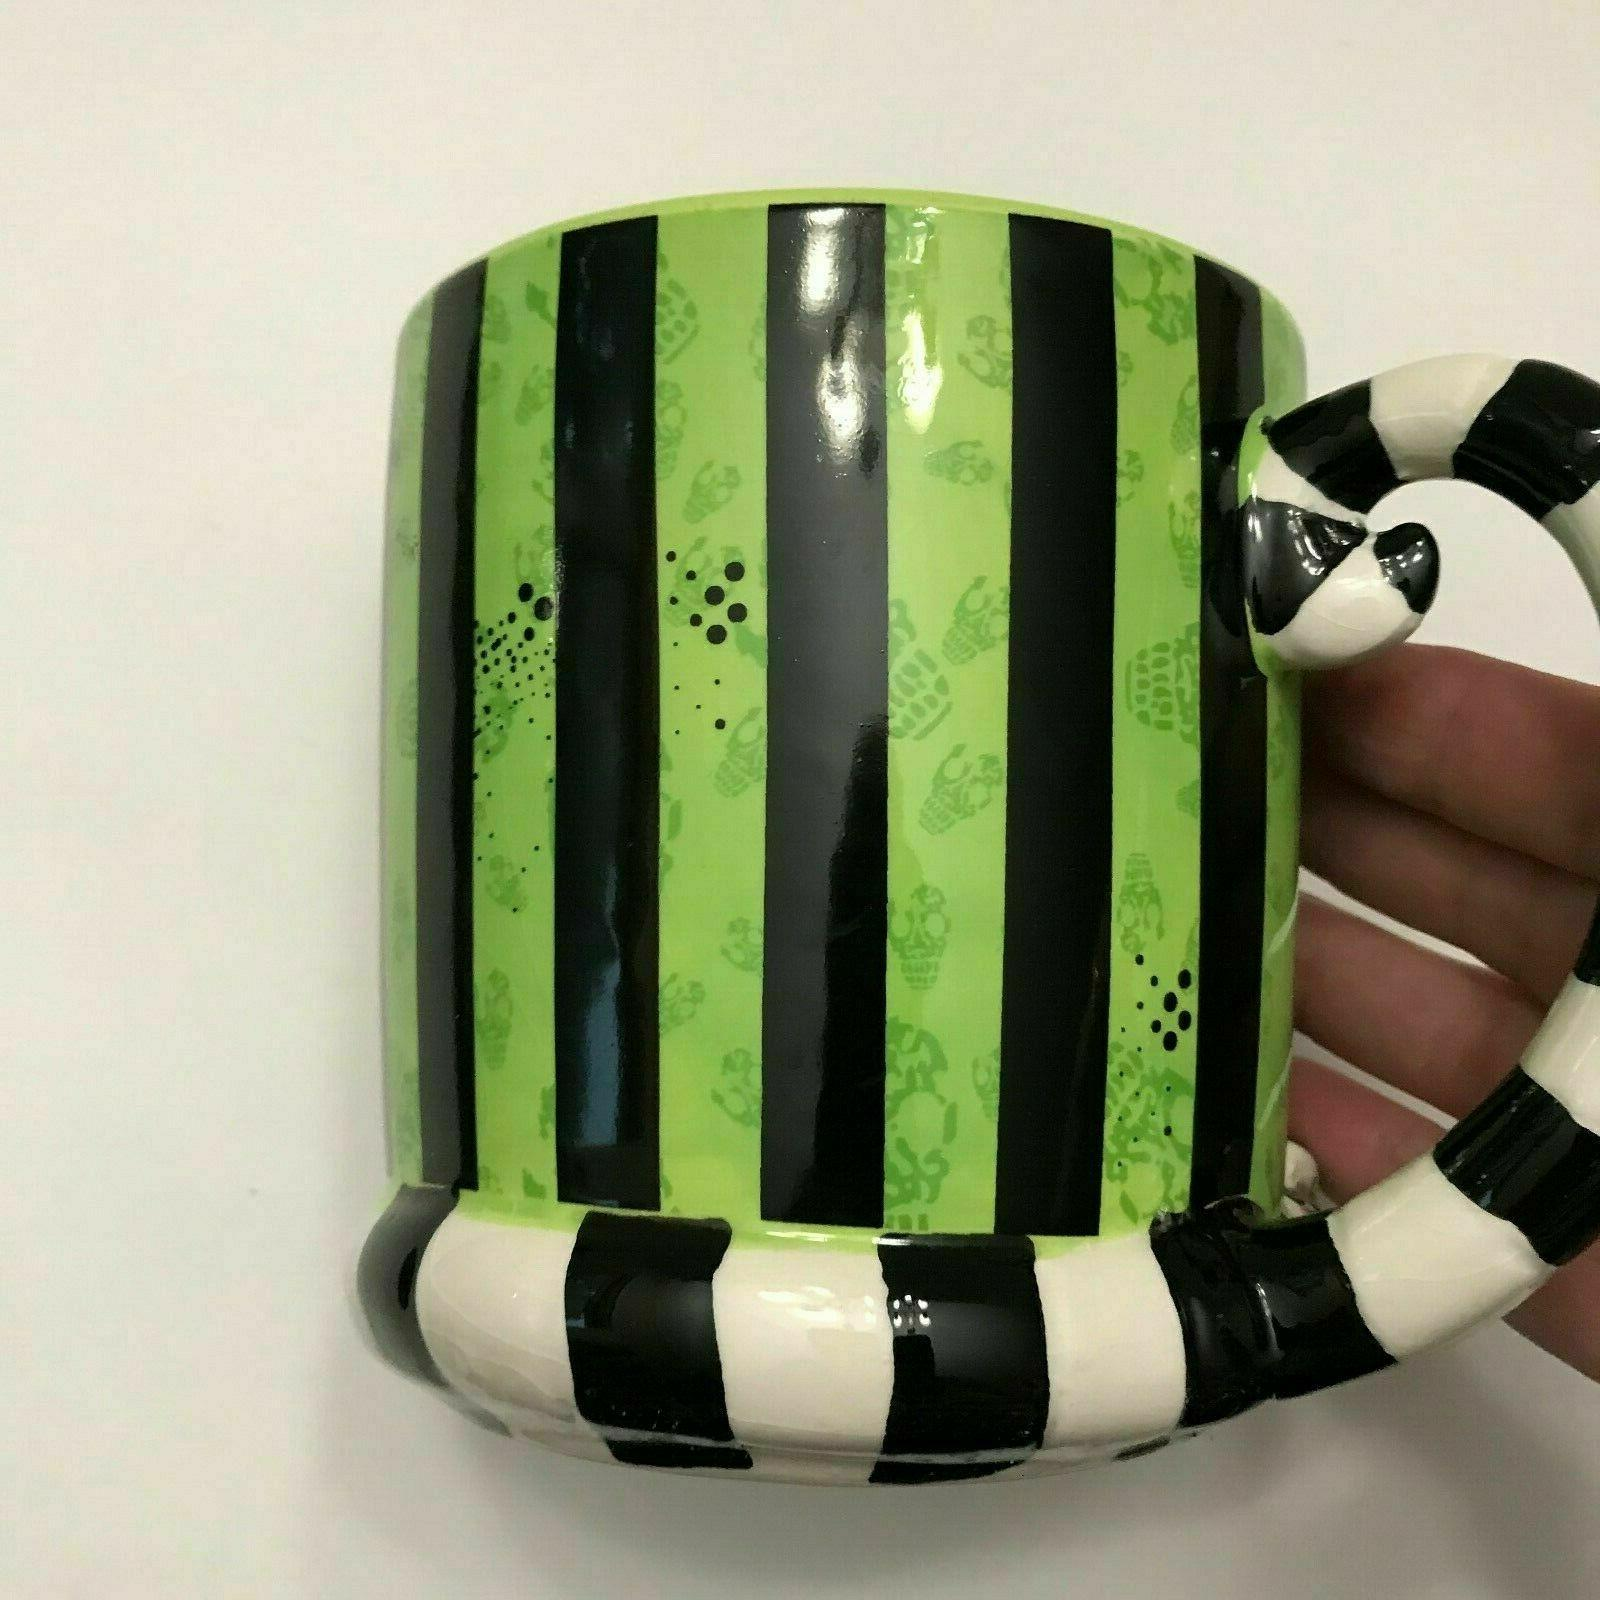 Beetlejuice Coffee Tim Burton Novelty Design Ceramic Cup